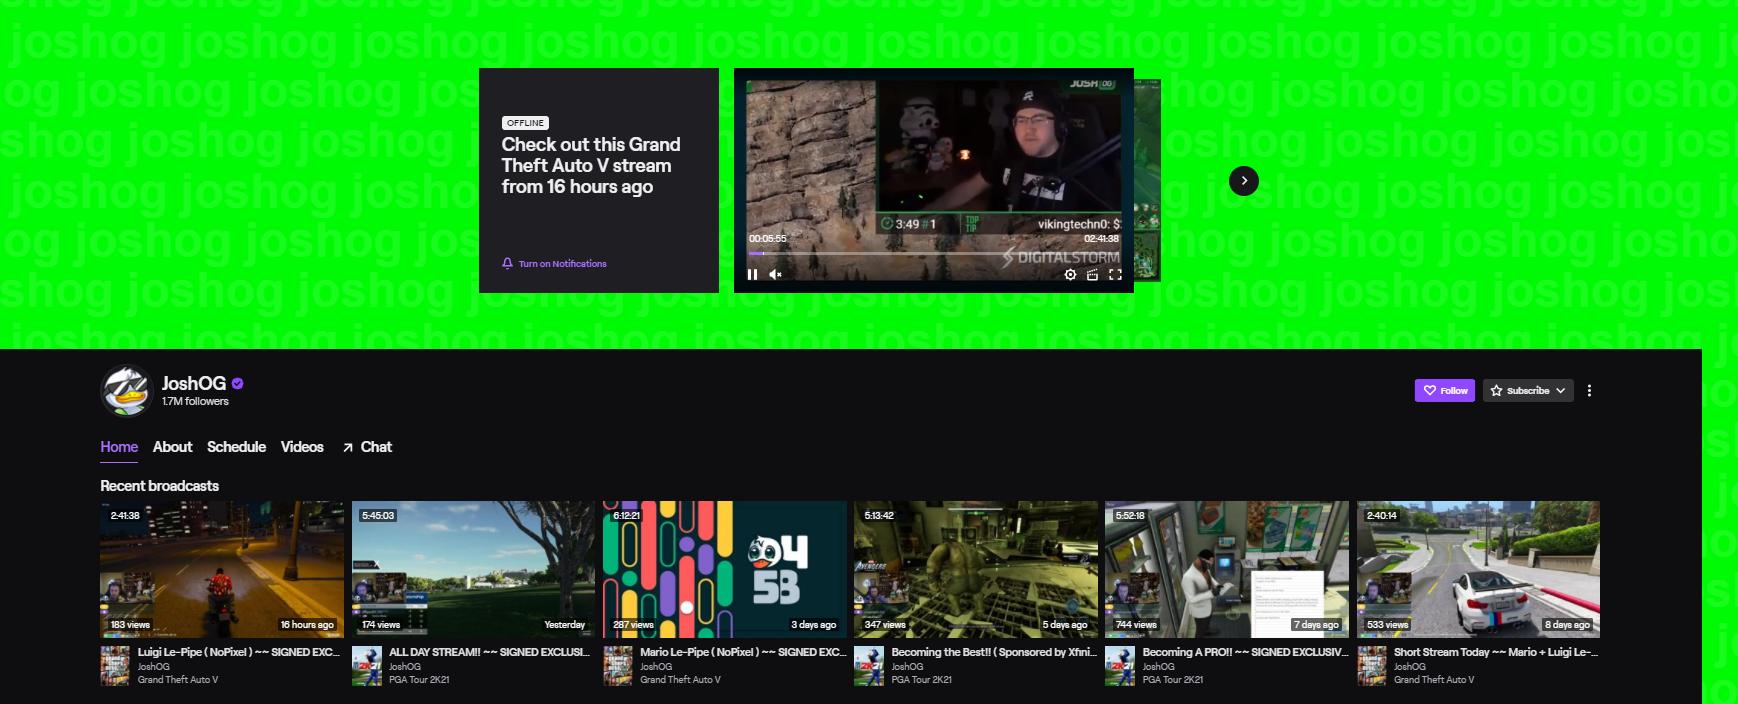 JoshOG top twitch streamers